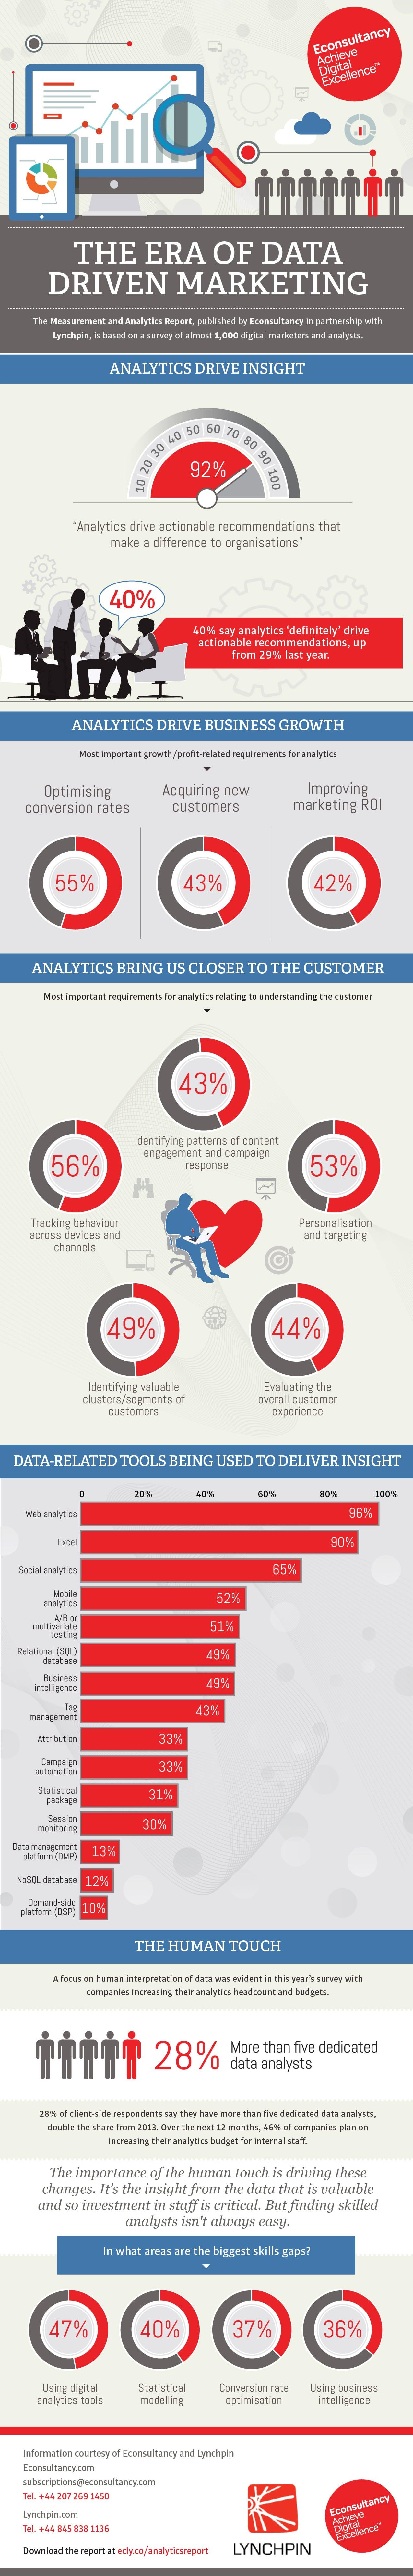 Measurement and Analytics infographic